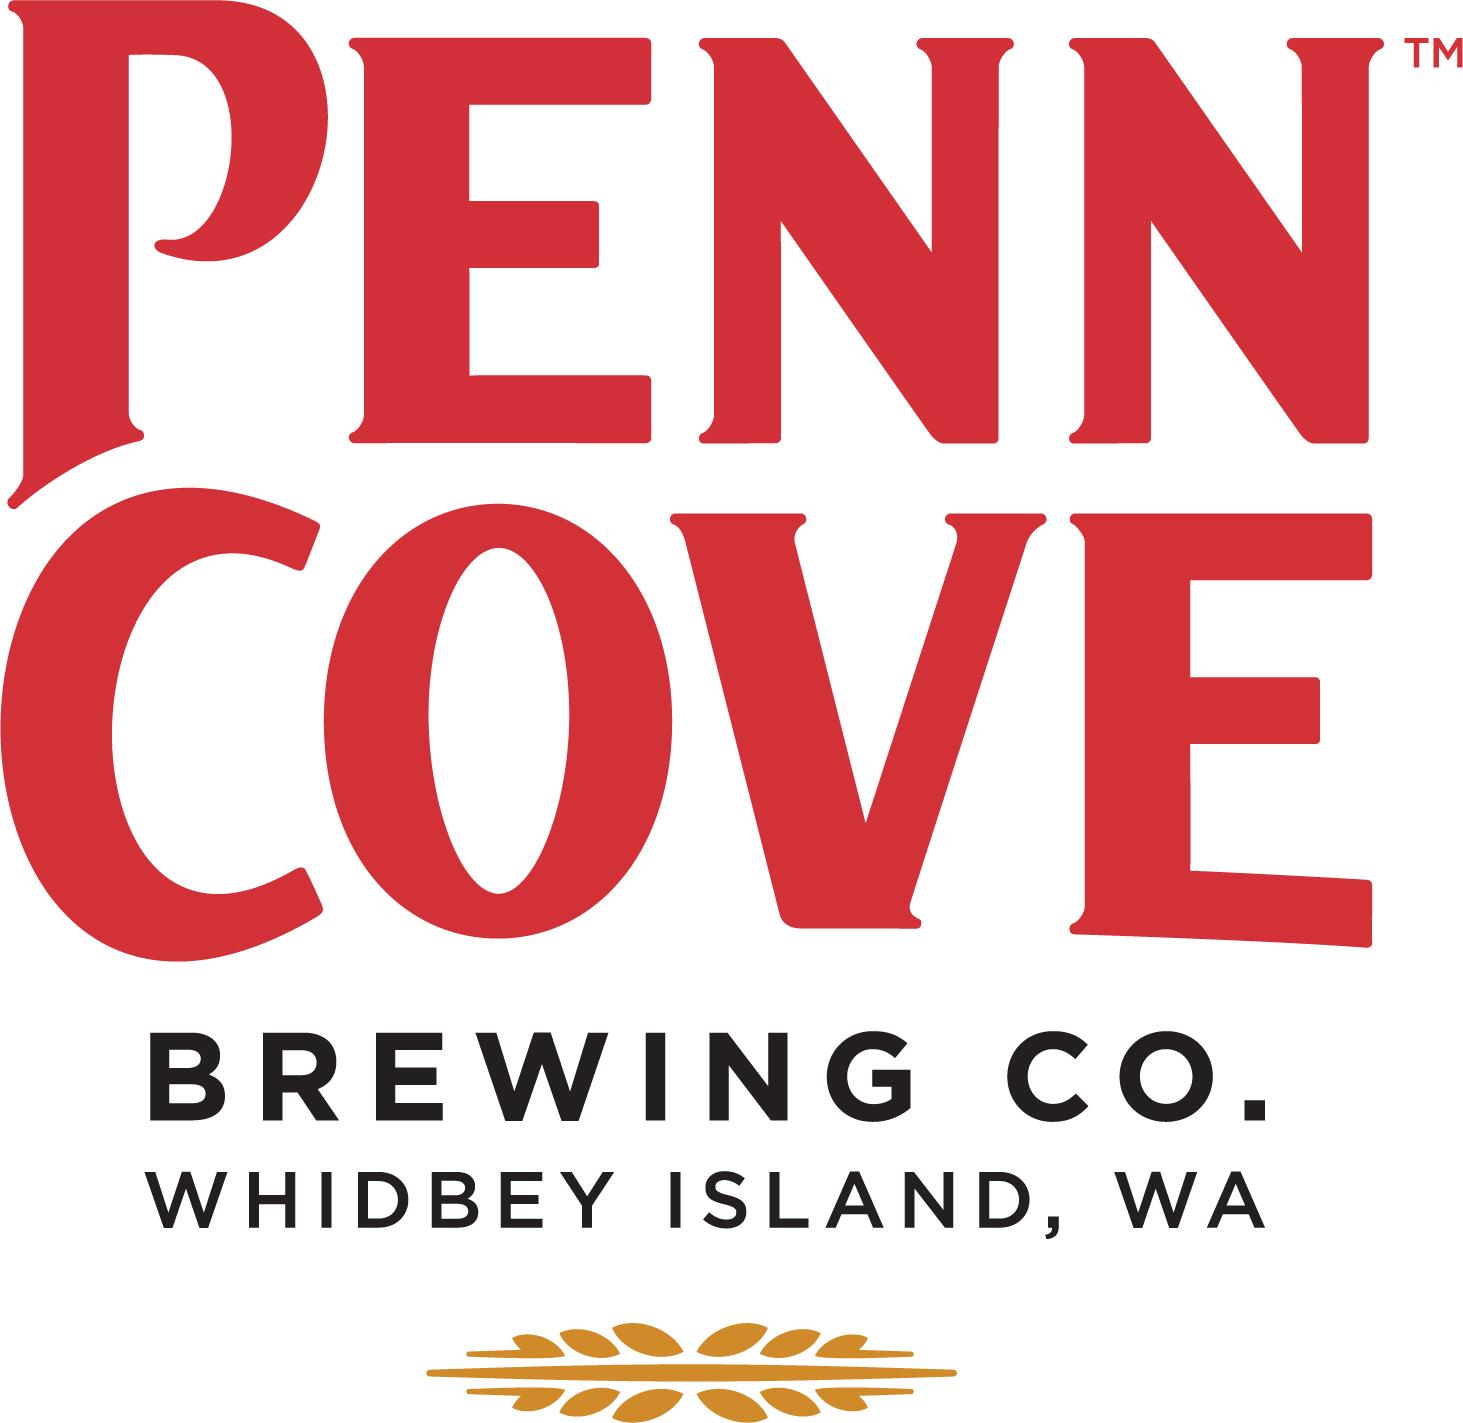 Silver - Hole Sponsor - Penn Cove Brewing Co. - Logo